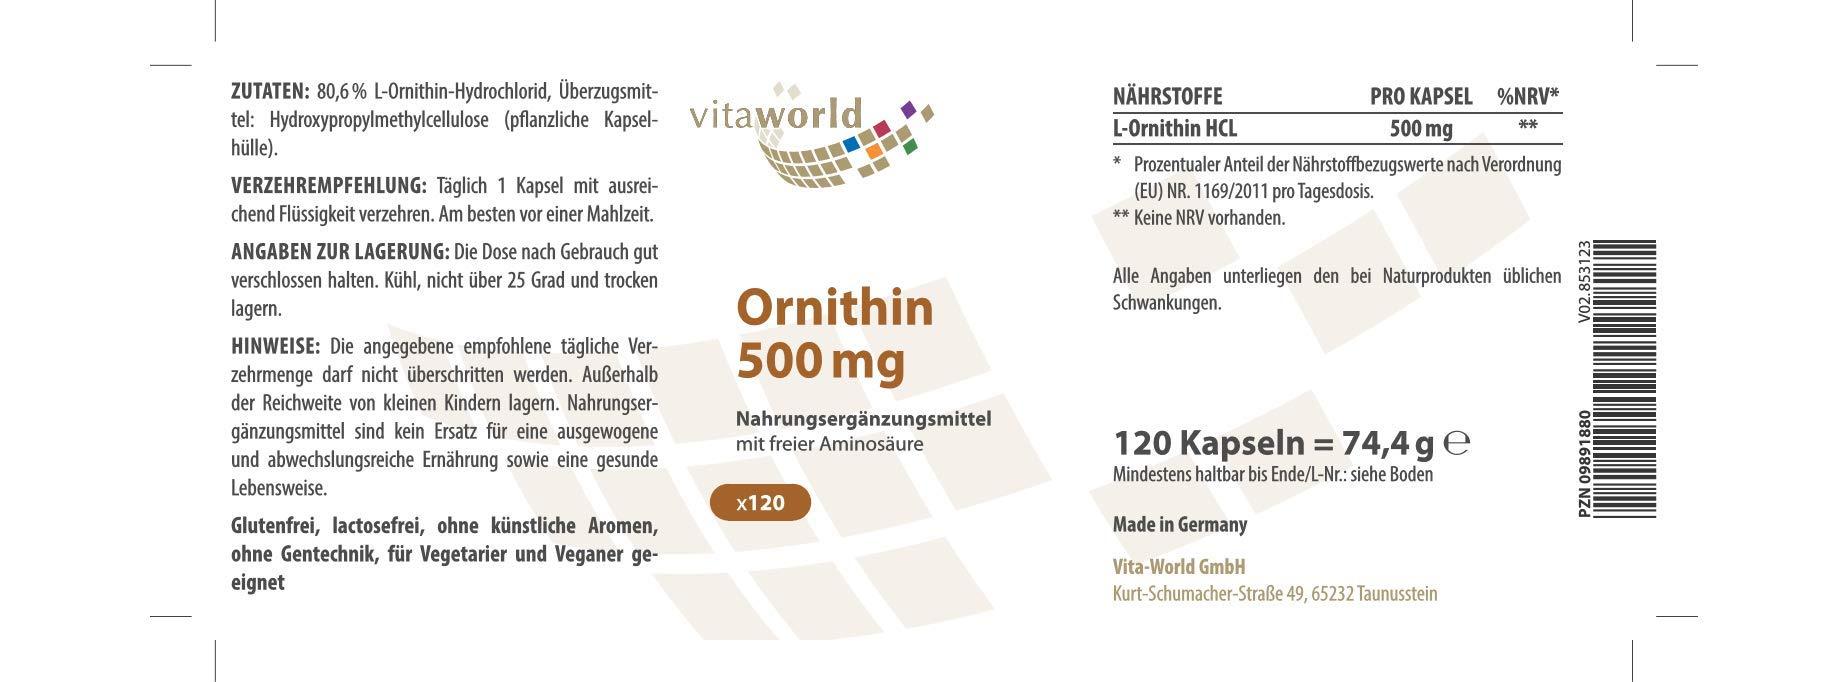 Vita World L-Ornithine 500mg 120 Vegetarian Capsules Made in Germany